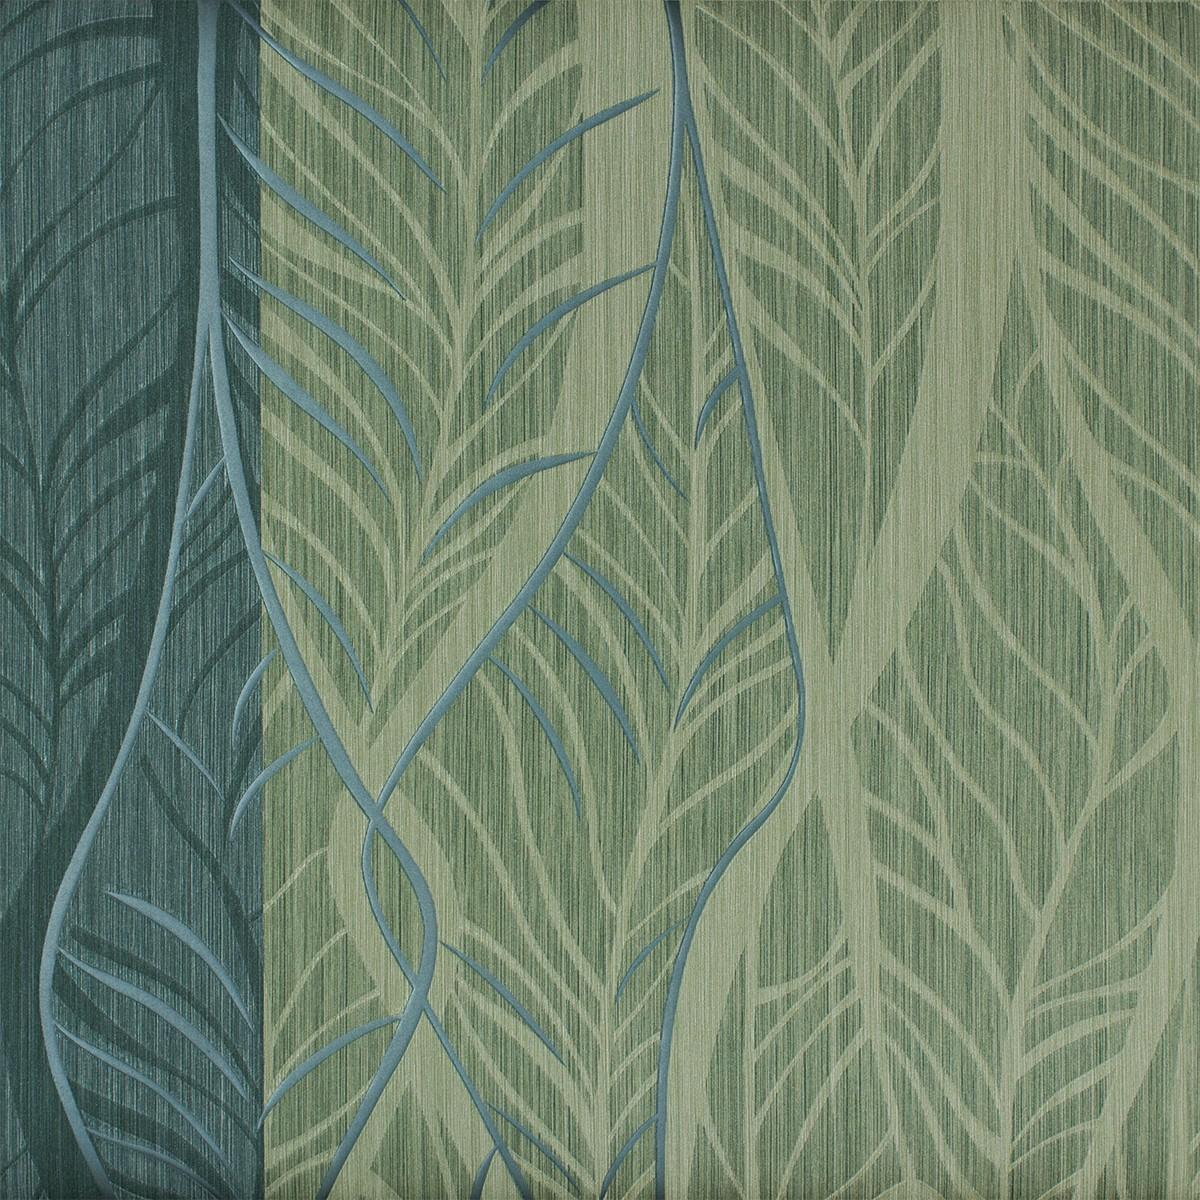 Tapete Streifen Blu00e4tter gru00fcn blau Tapeten Rasch Textil ...